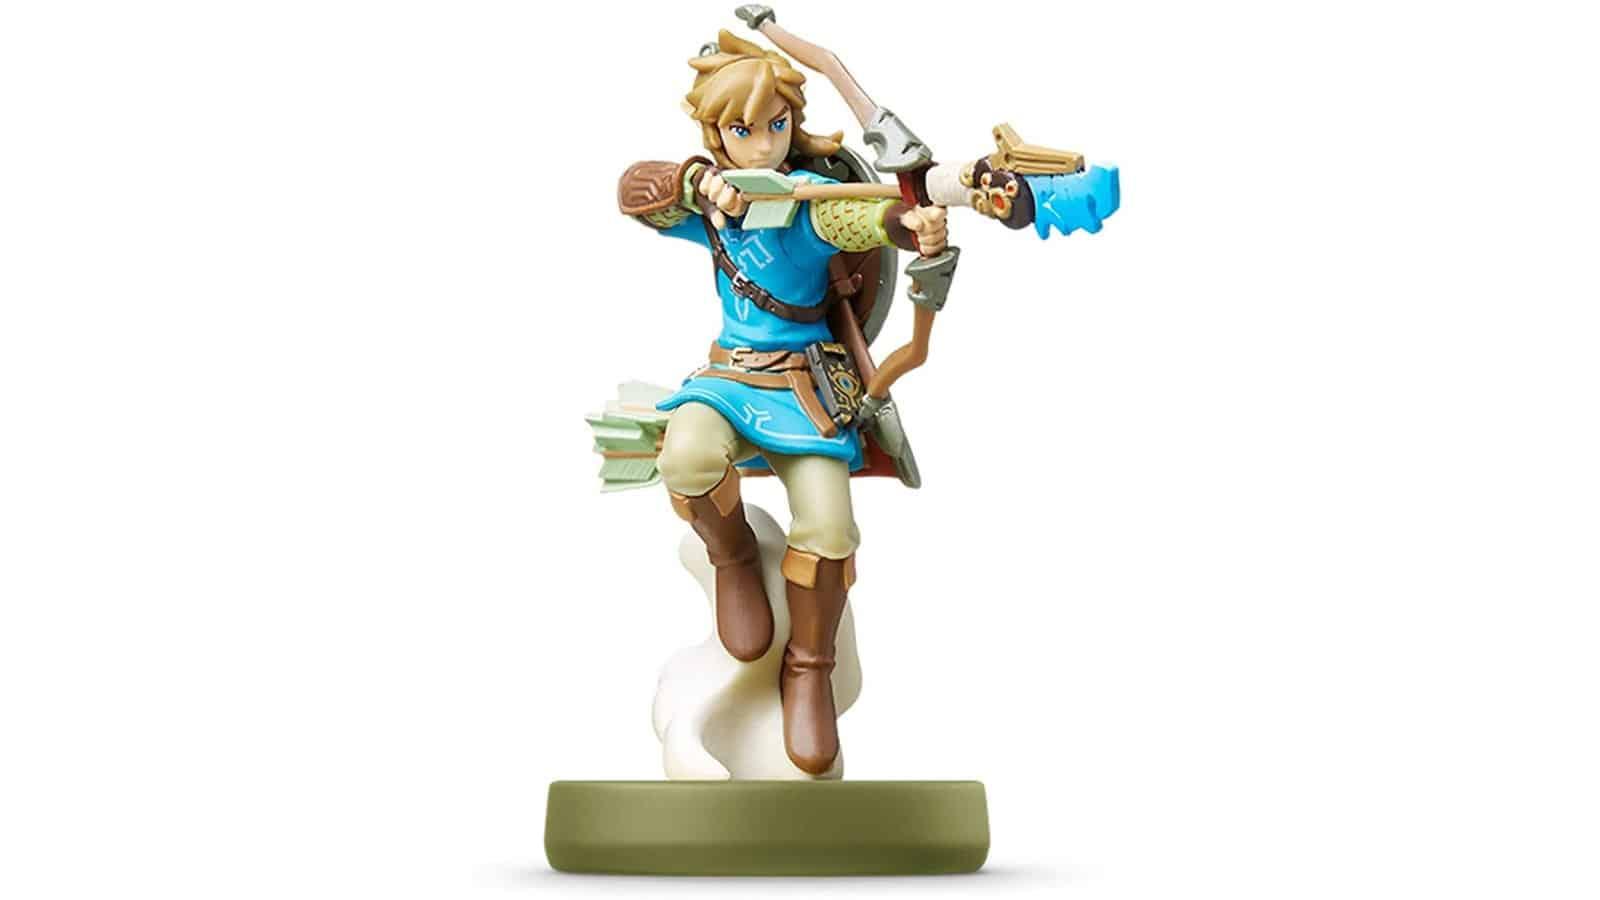 אמיבו - Link - Archer (סדרת The Legend of Zelda: Breath of the Wild)